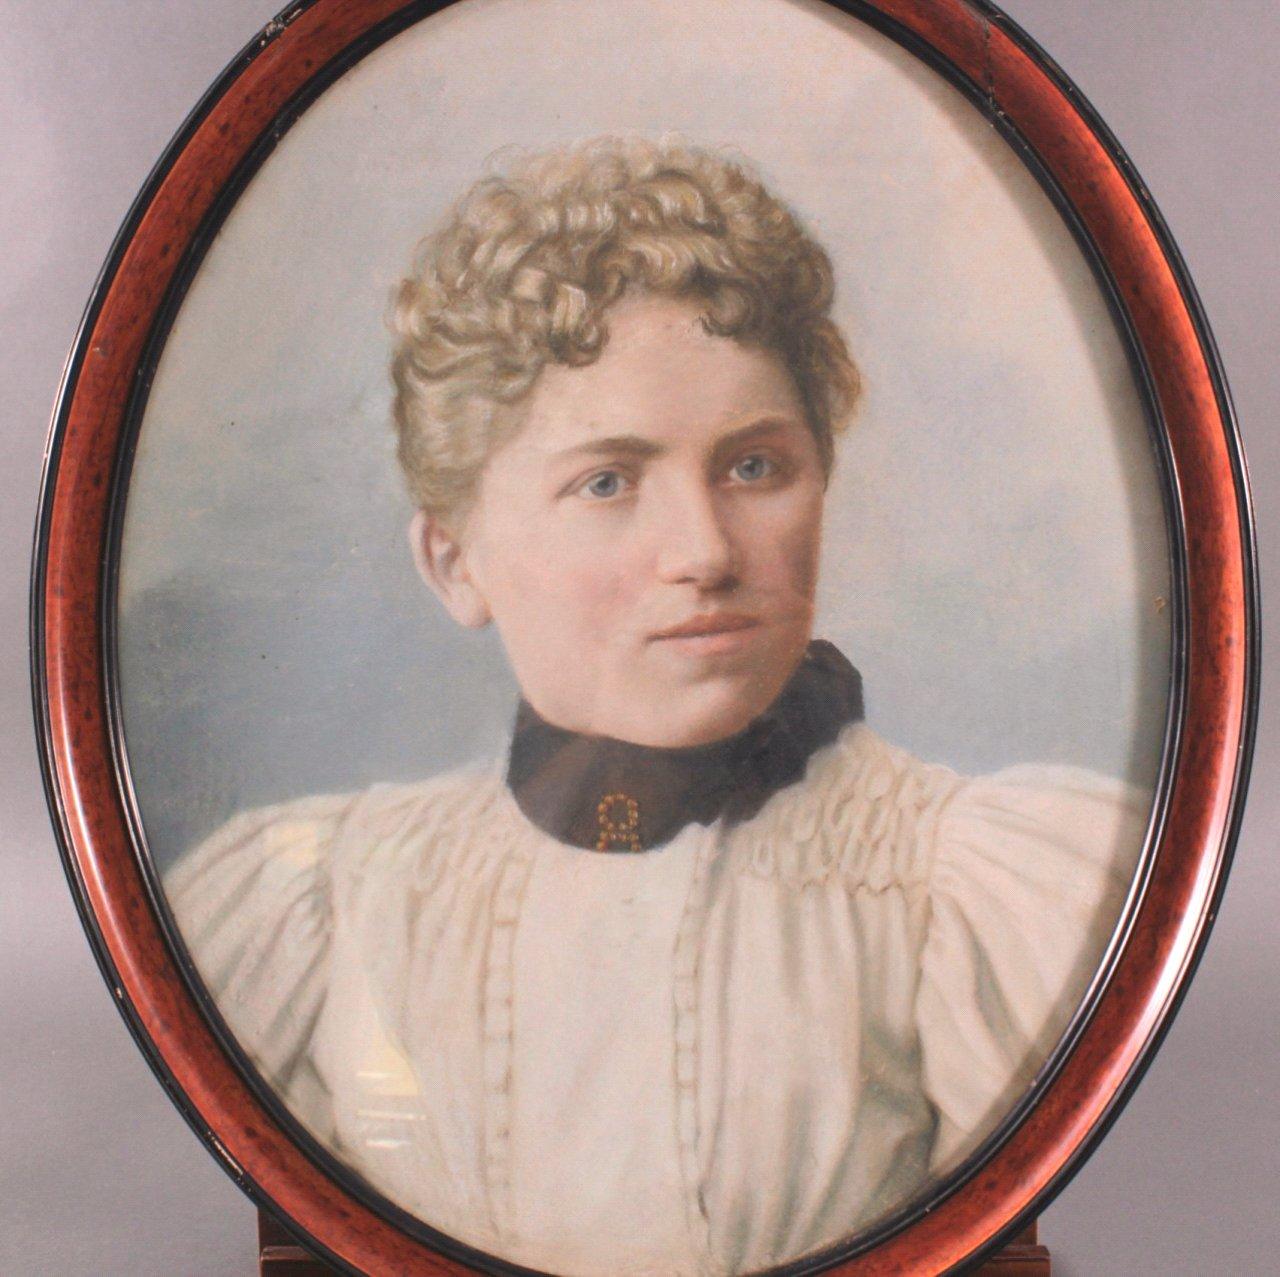 Damenporträt um 1900-1